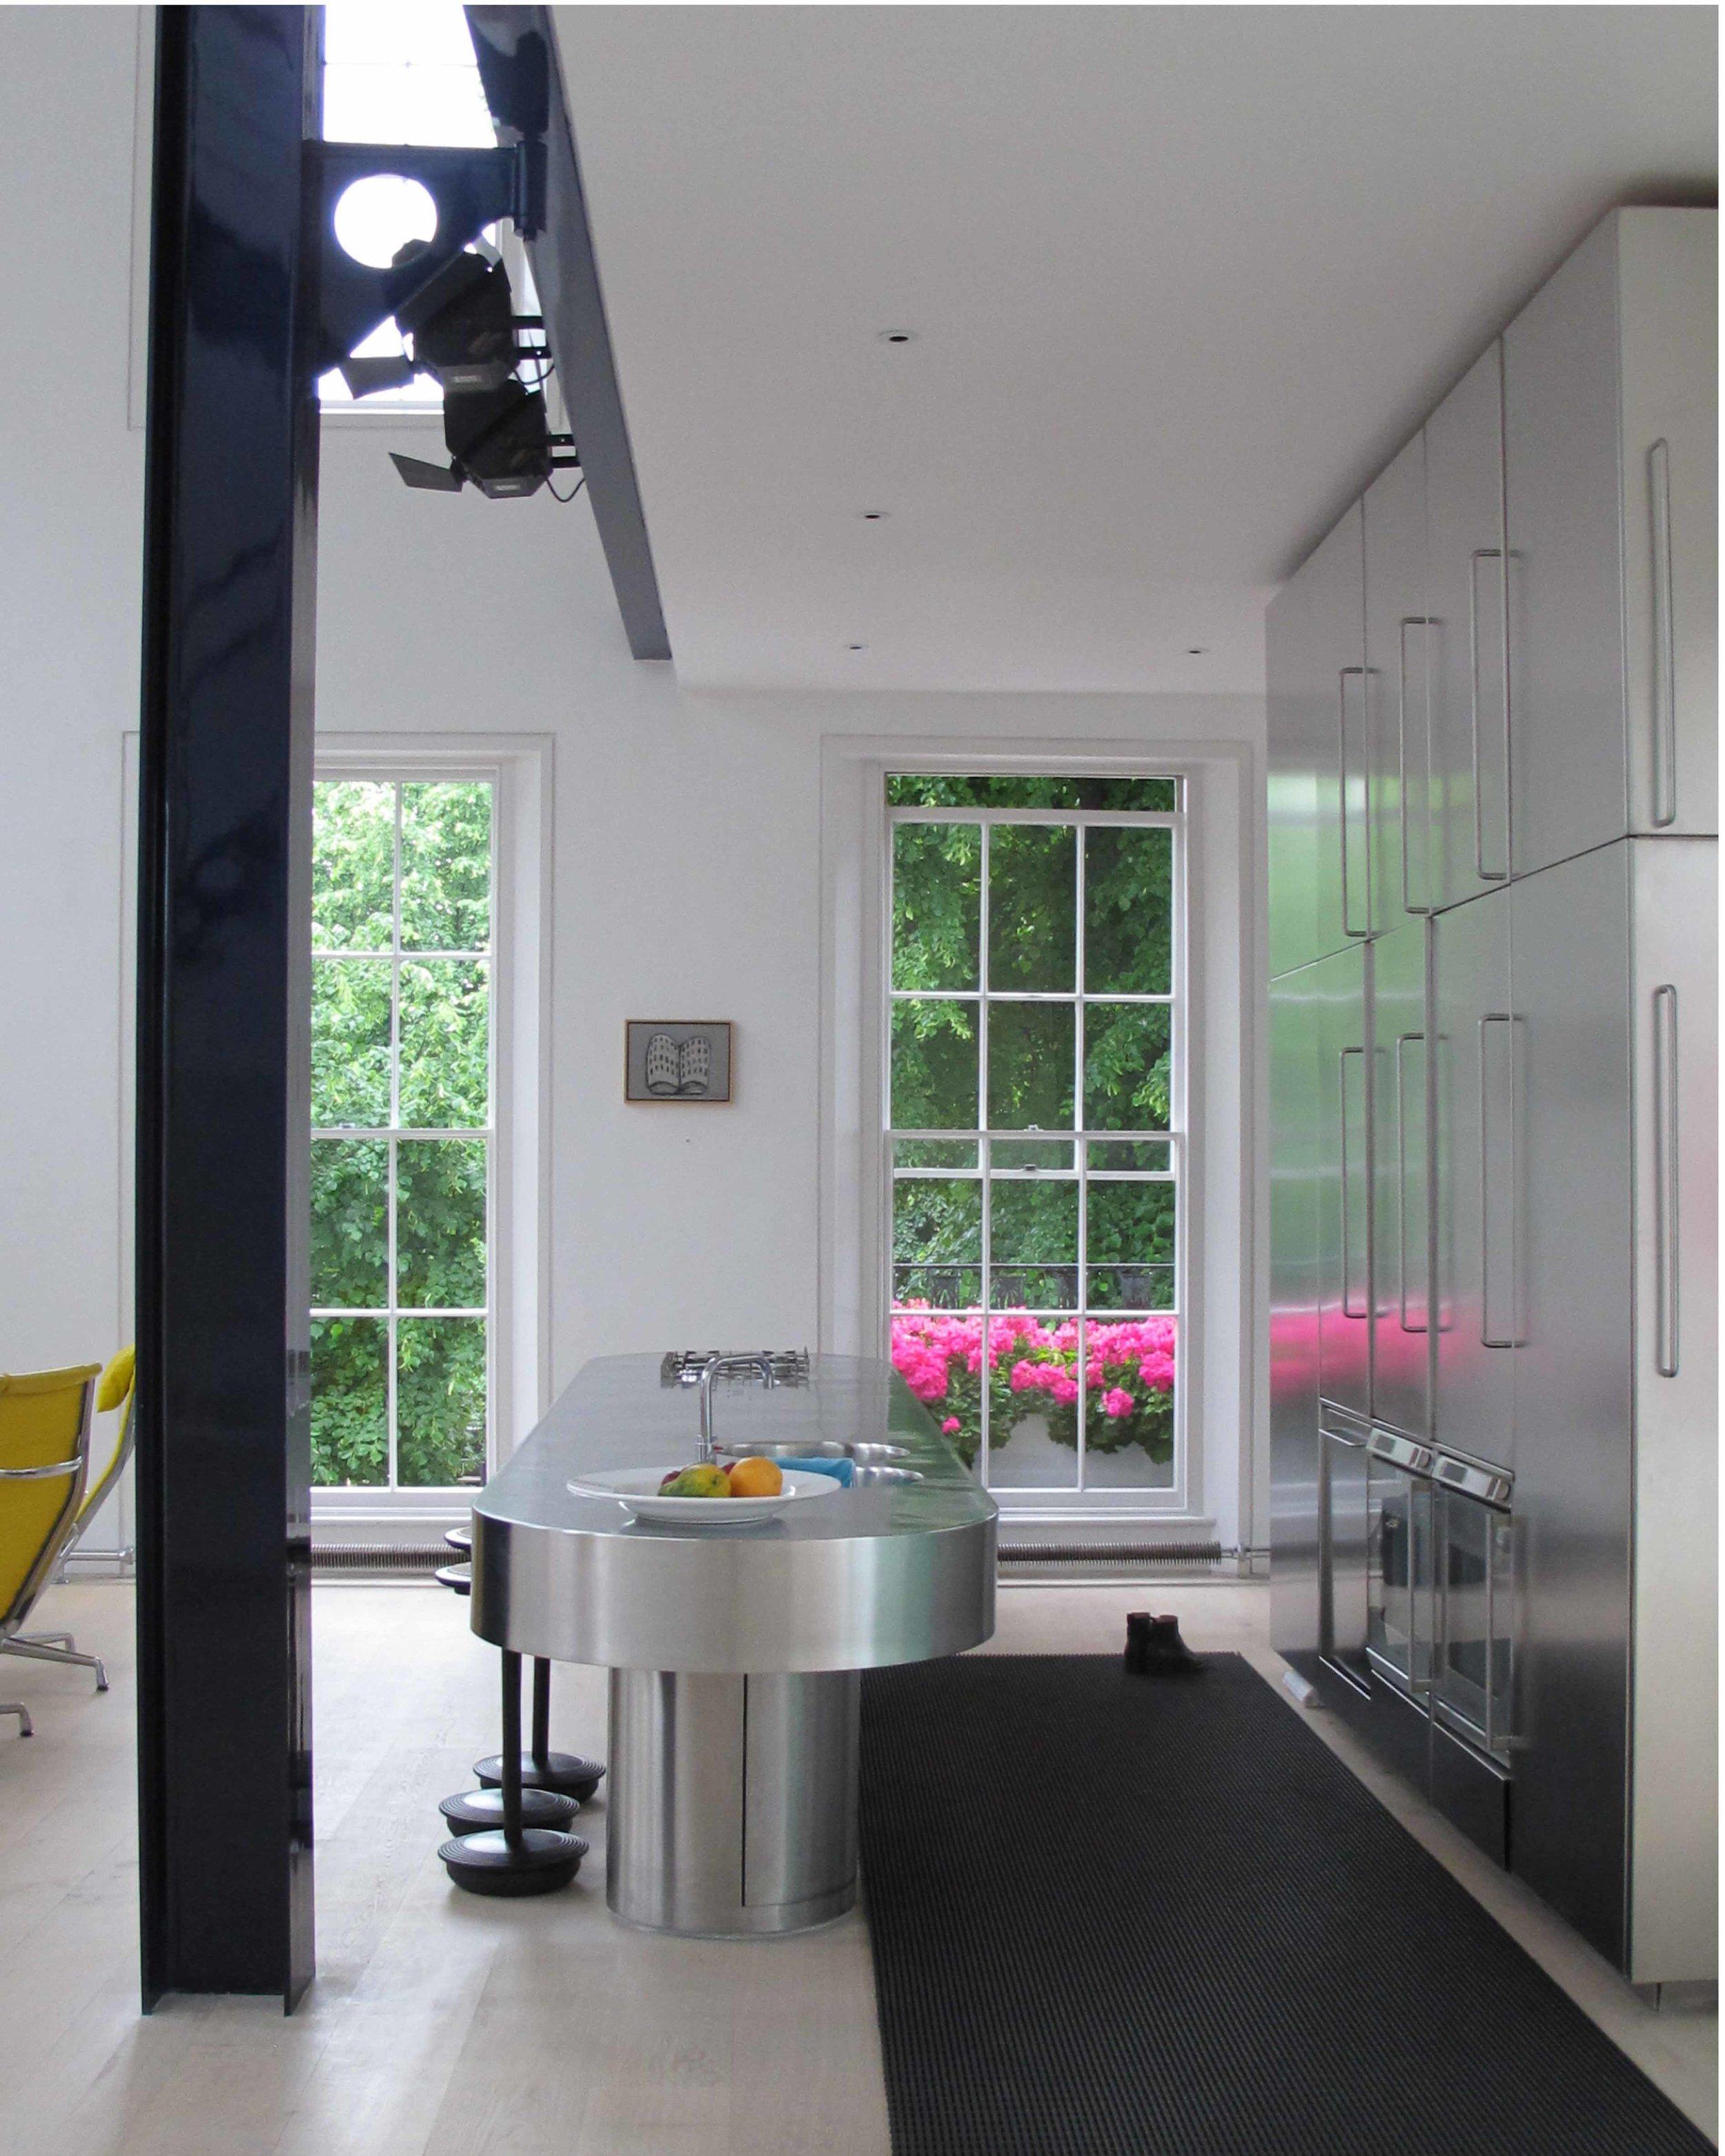 The kitchen. Polished stainless steel, dinesen floor boards. Georgian terrace house refurbishment.